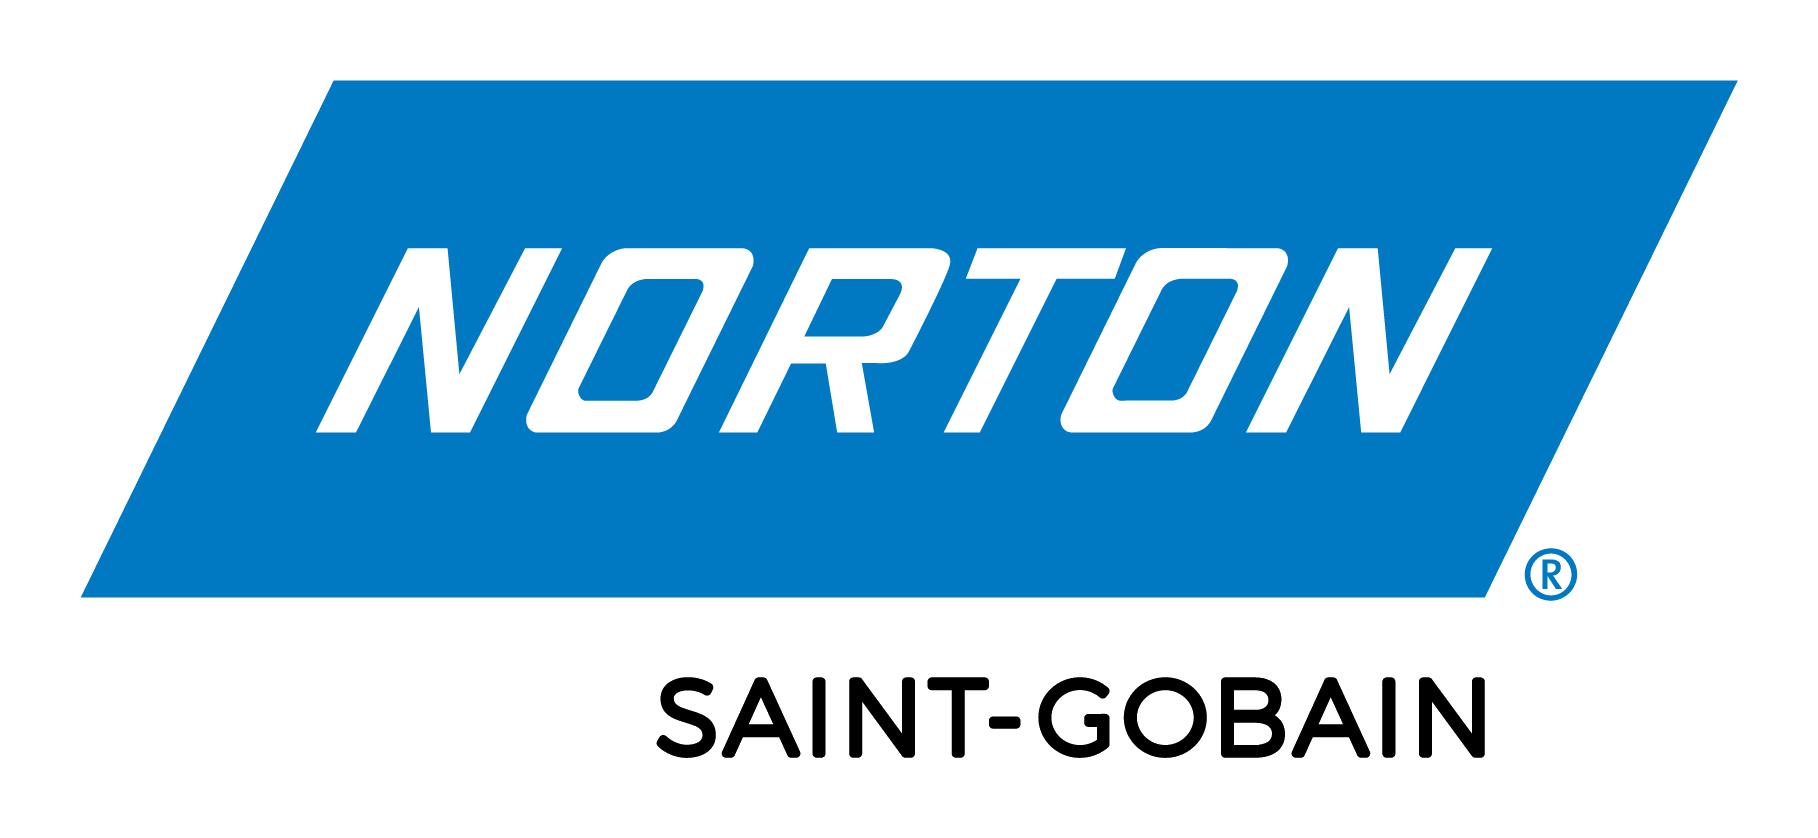 SG_Norton_logo_rgb_17